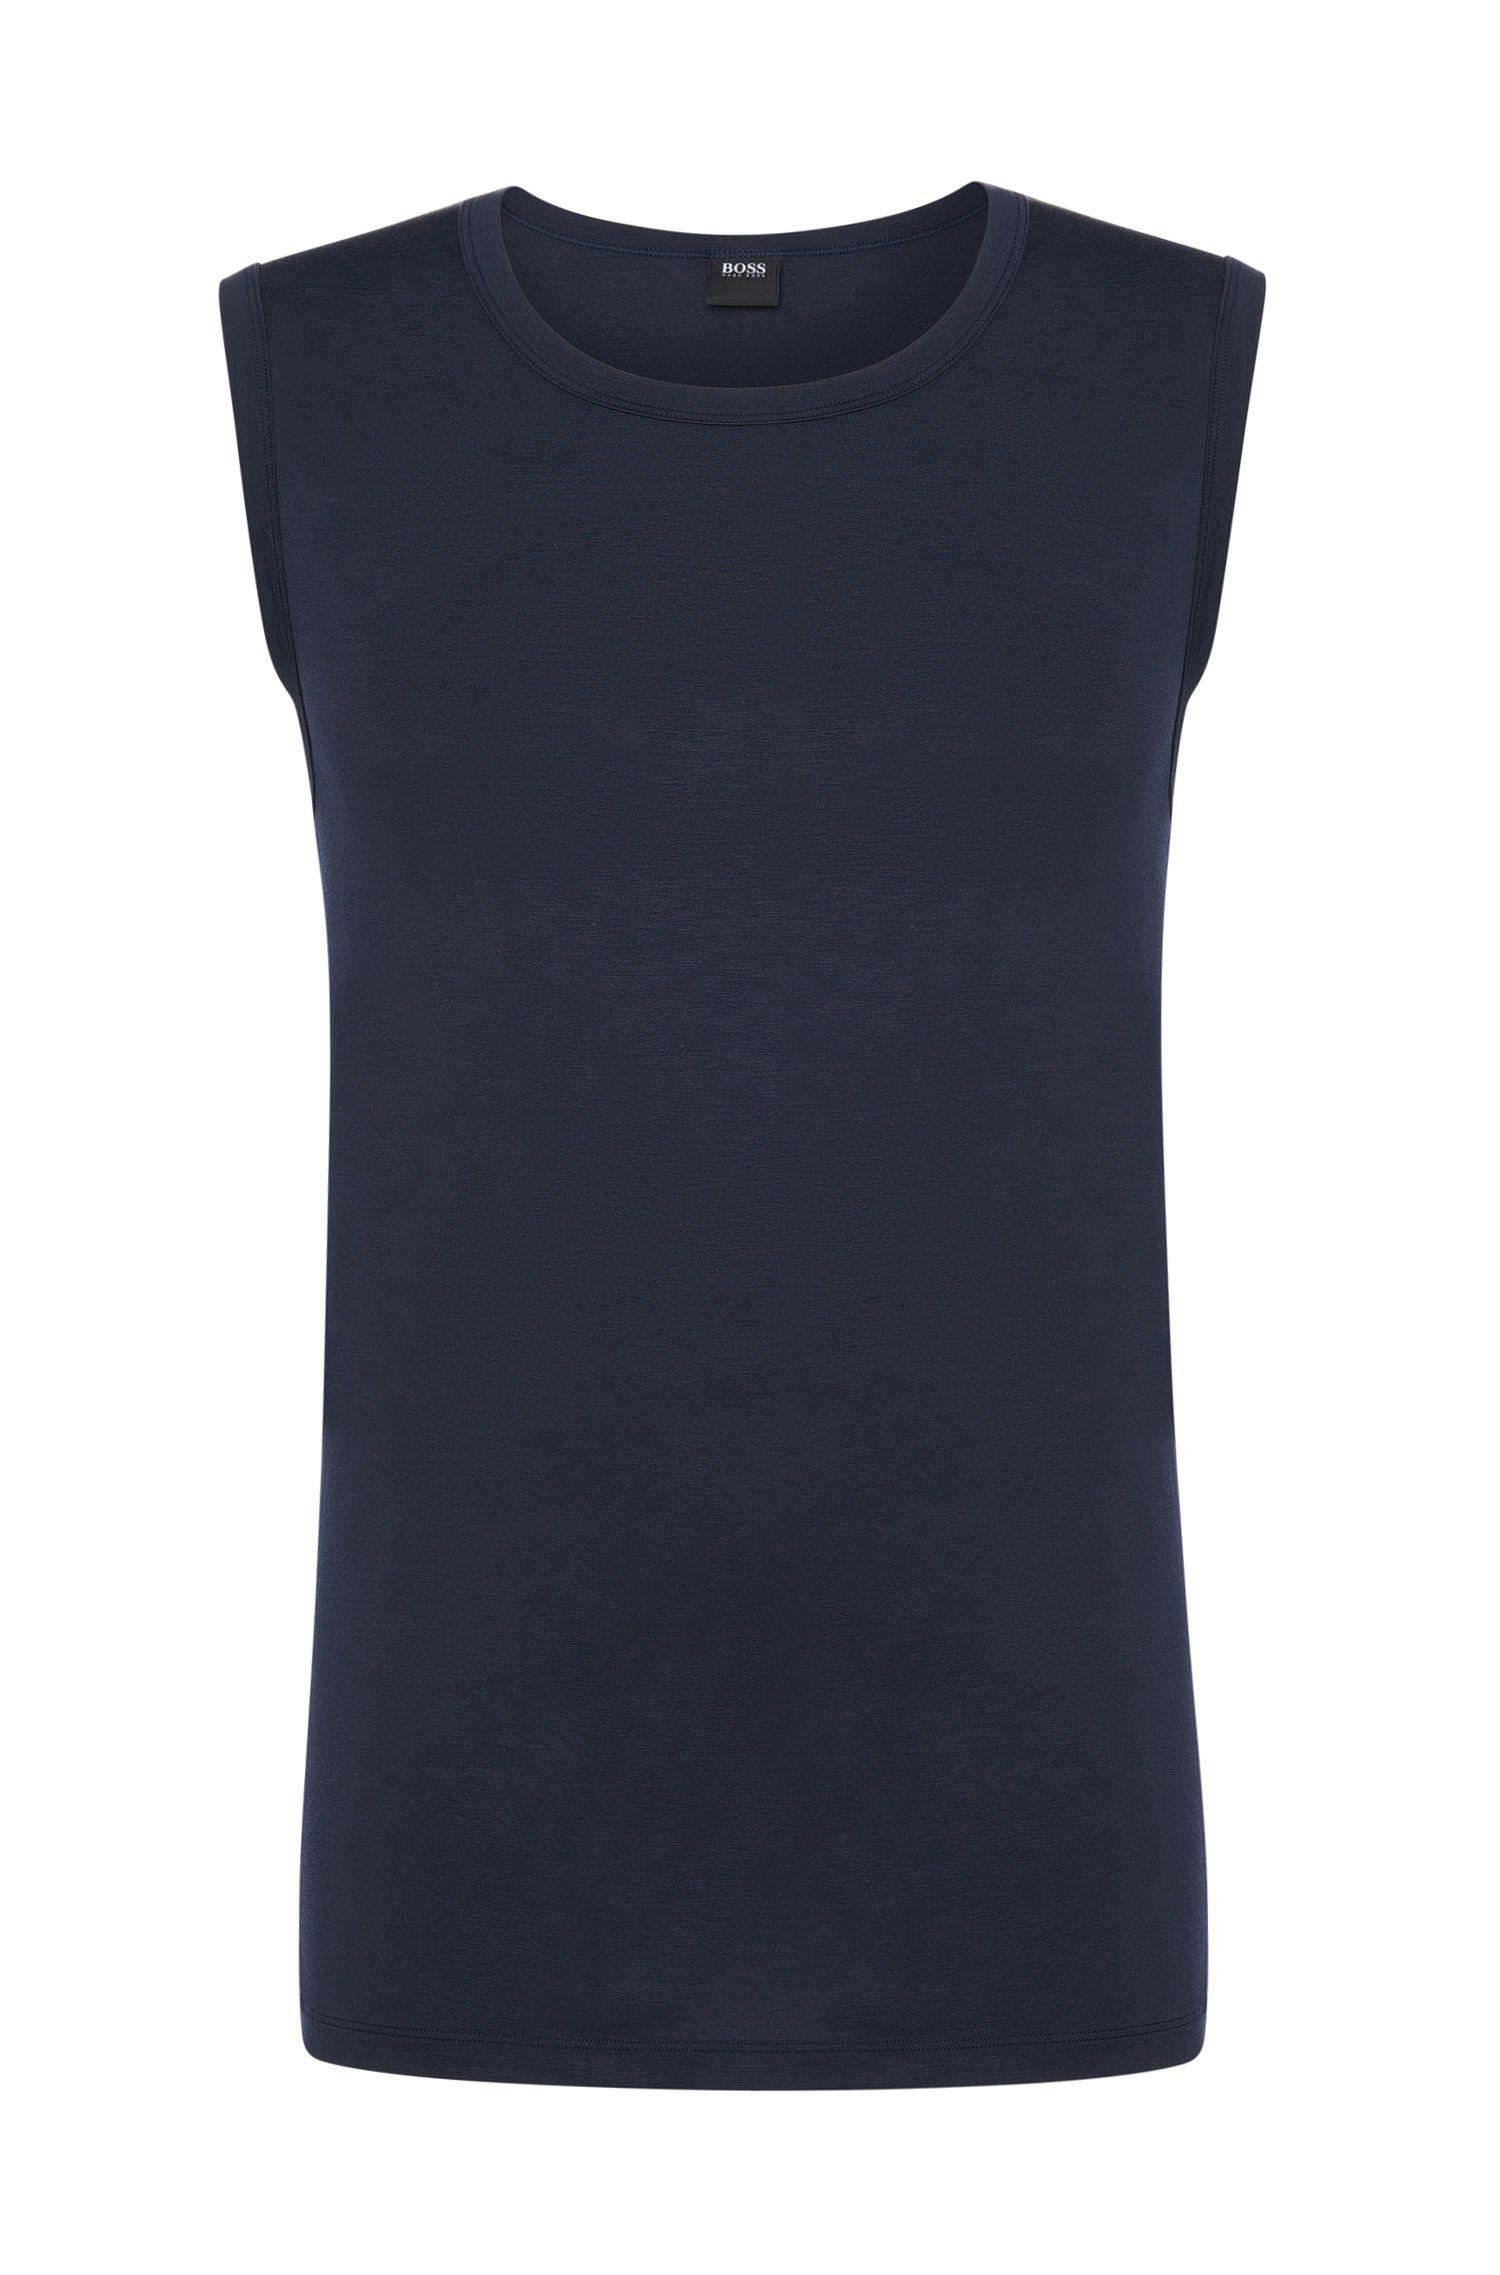 'Shirt SL RN Seacell'   Stretch Modal Blend Sleeveless T-Shirt